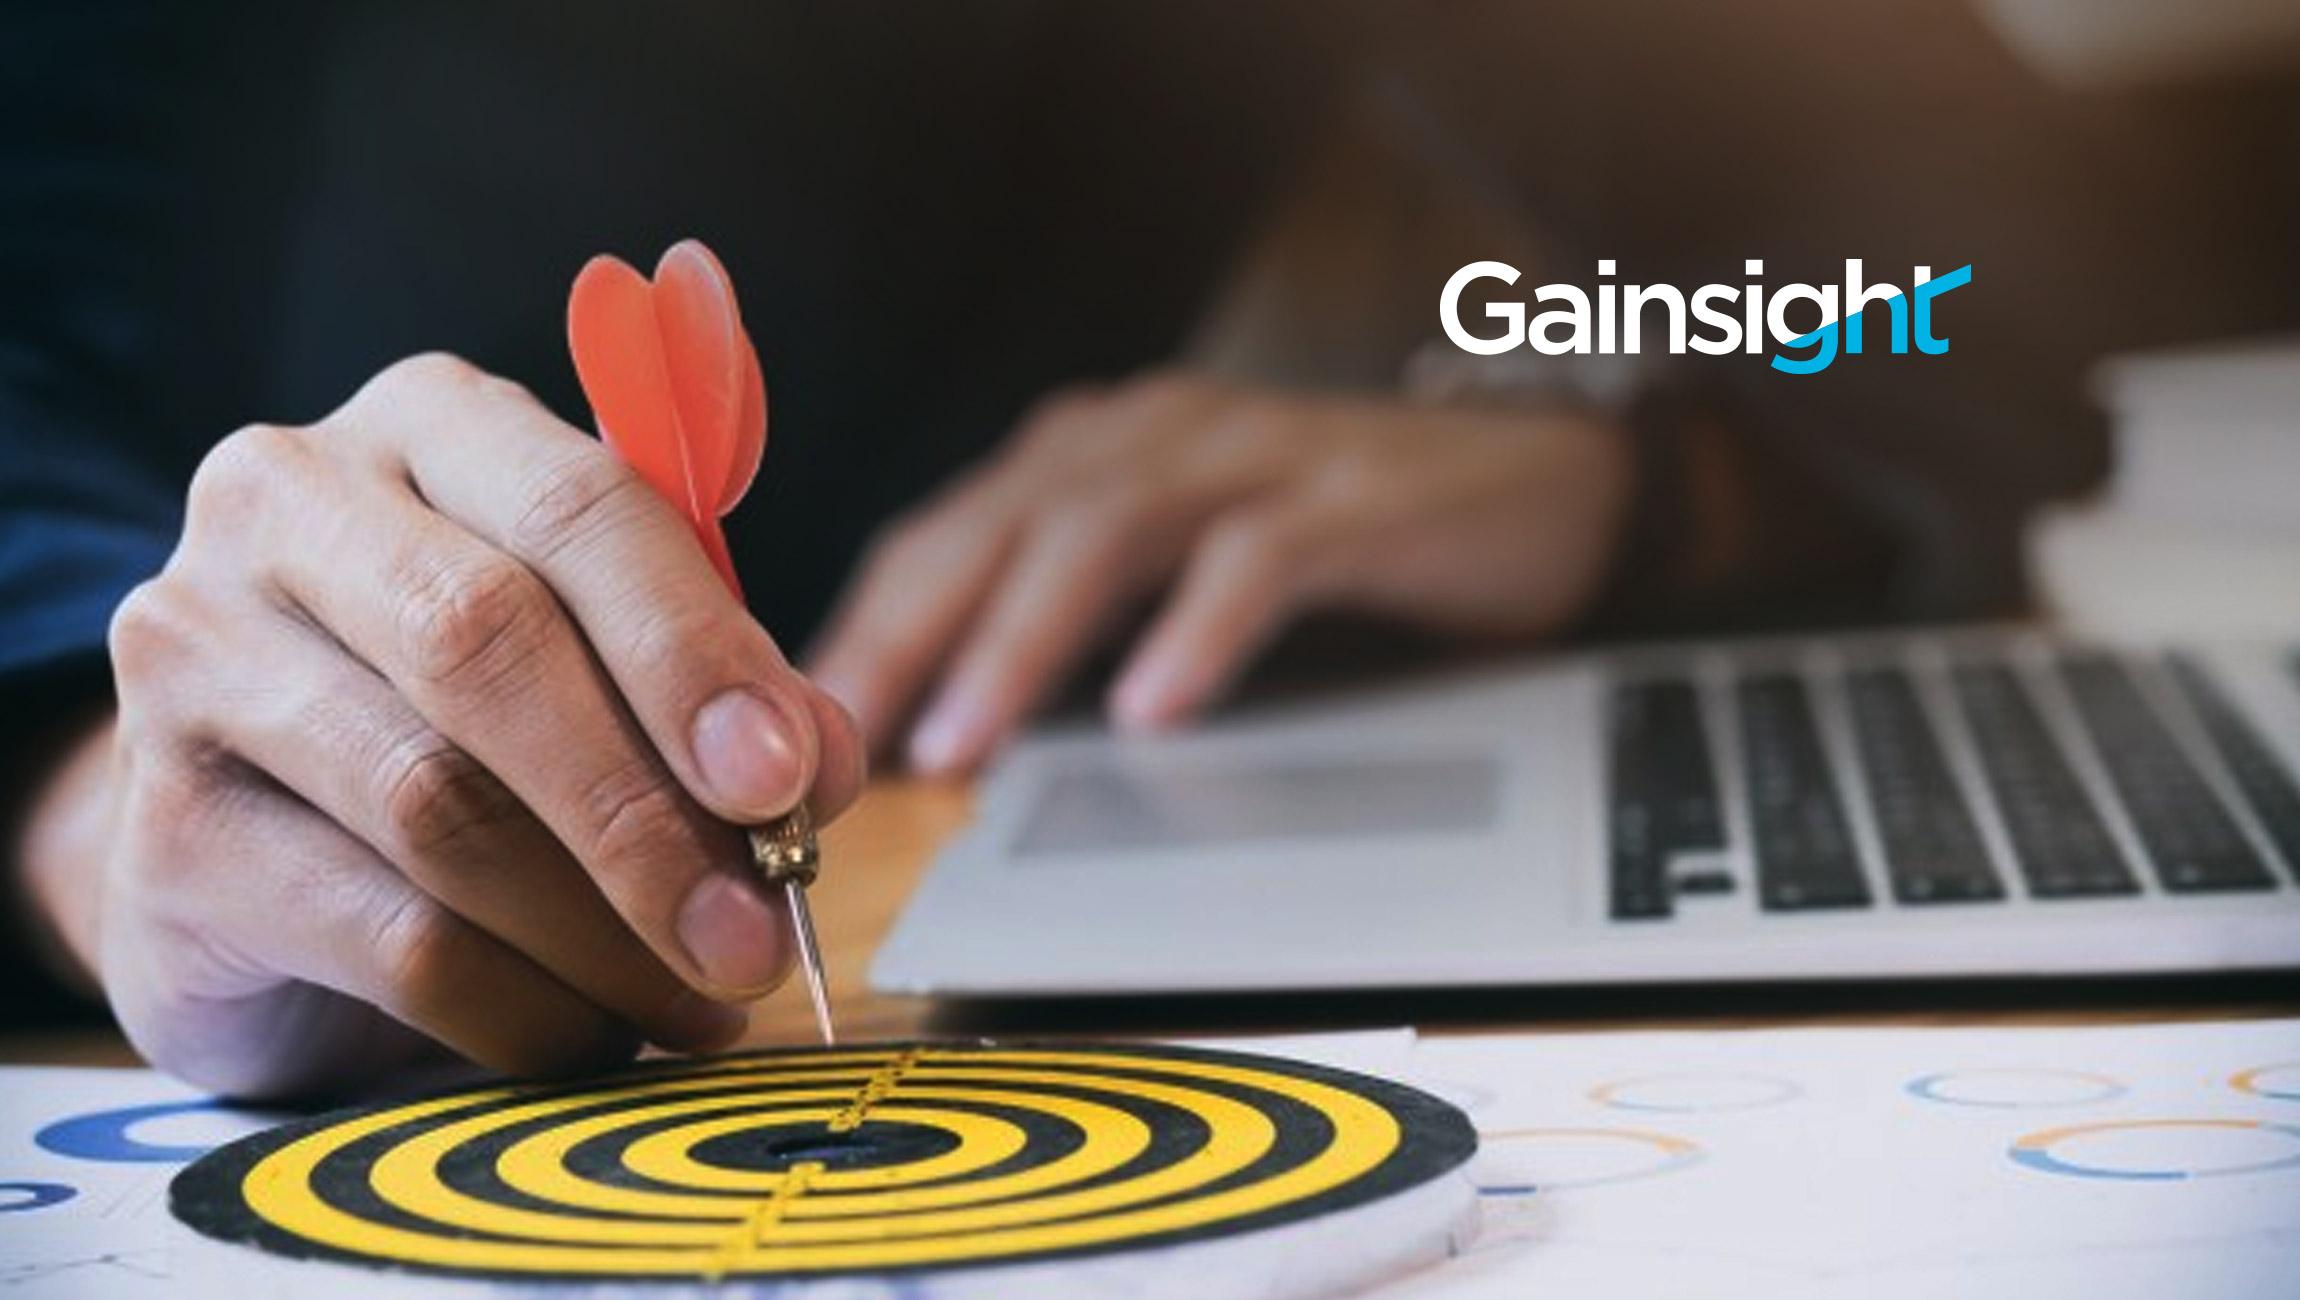 Gainsight Taps inSided to Provide B2B Customer Success Community Platform